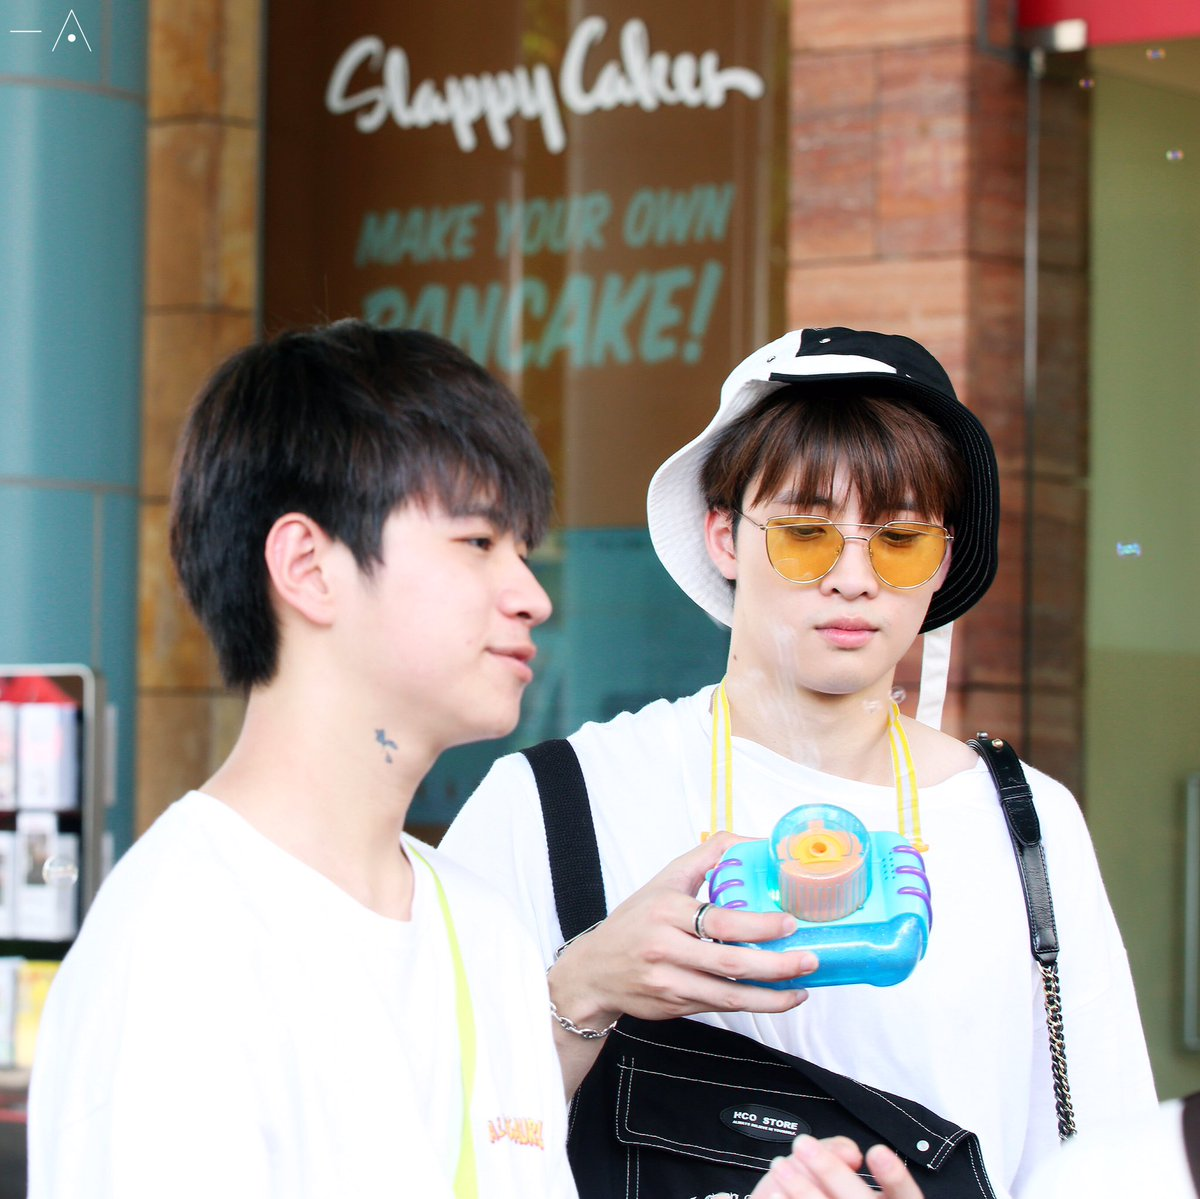 "20191012 2wish Singapore Honeymoon in USS  Kindergarten boy Mean tried to attract his sweetheart Plan. ""Look at me look at me!""   #CHAMESingaporeTripx2wishDay4 #2wish  #MeanPhiravich  #คนของแปลน @m34nismind @bplannnnn<br>http://pic.twitter.com/QN3xCfsZwf"